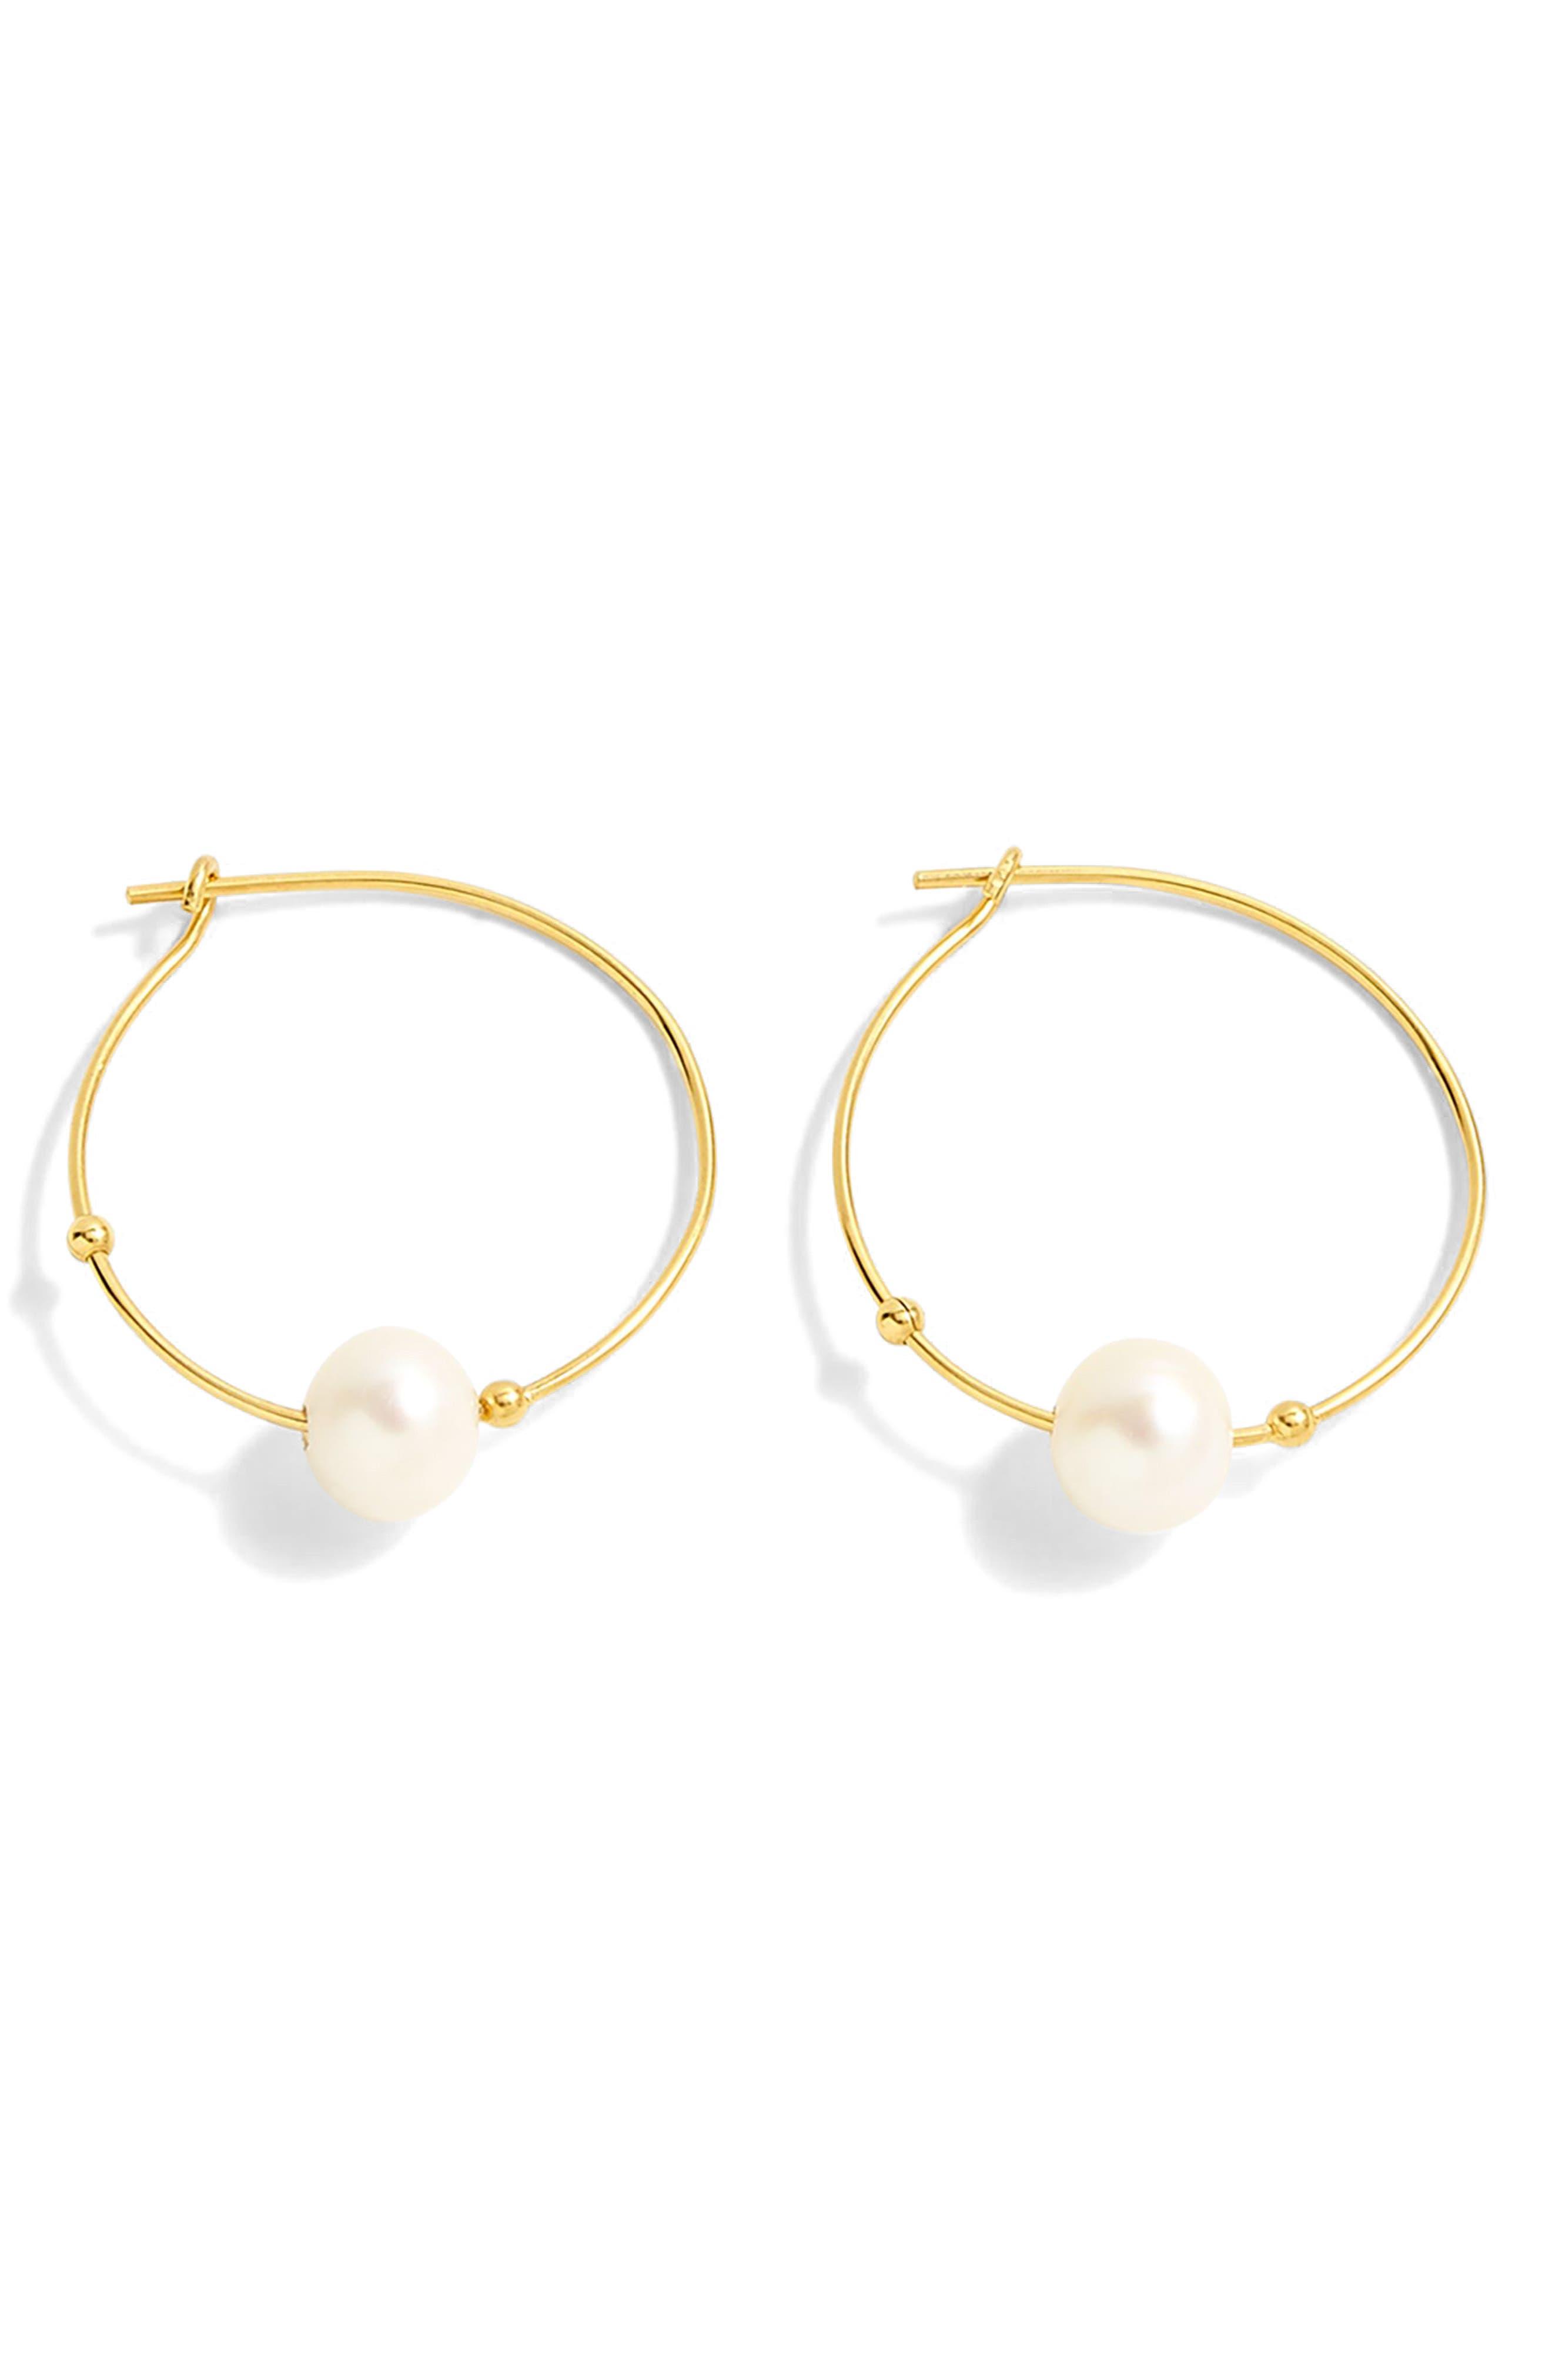 Single Pearl Hoop Earrings,                             Main thumbnail 1, color,                             710